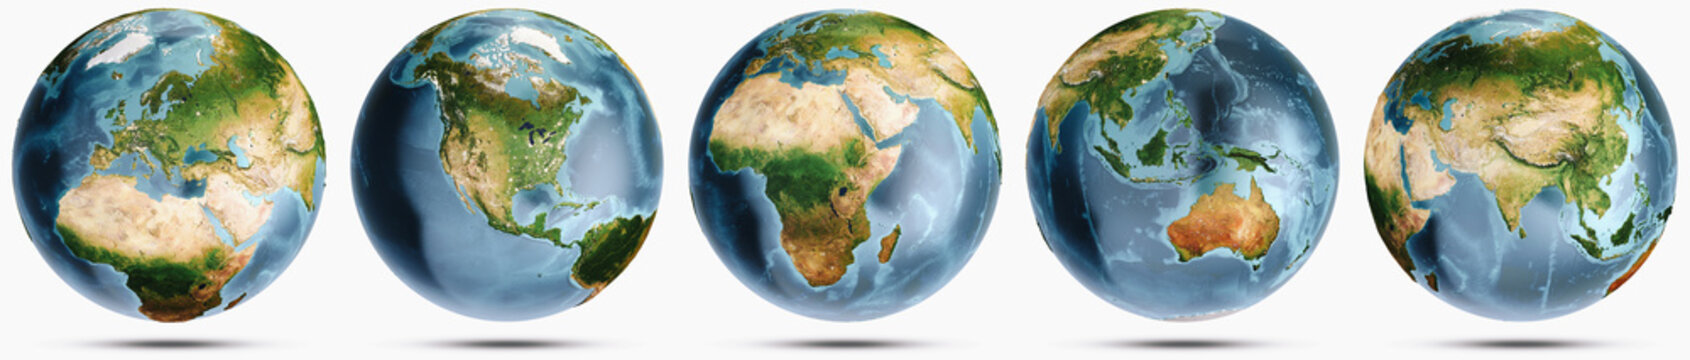 Planet Earth clear globe set